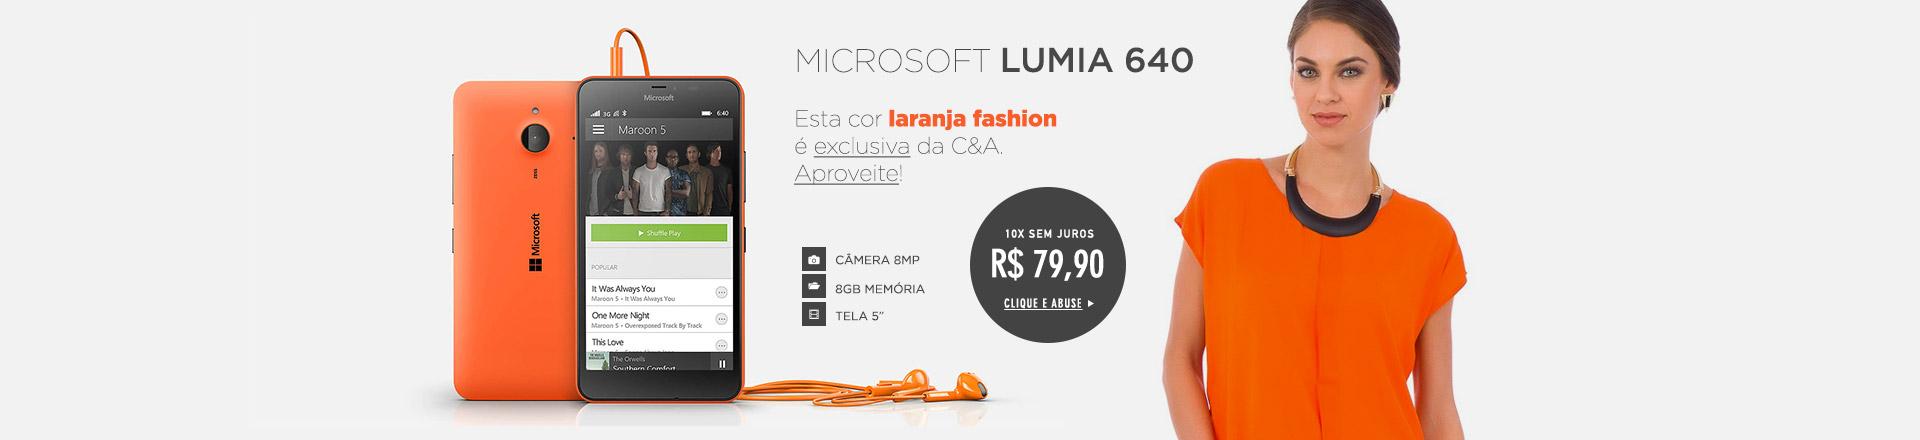 DEST24 FT lumia 640 23.06